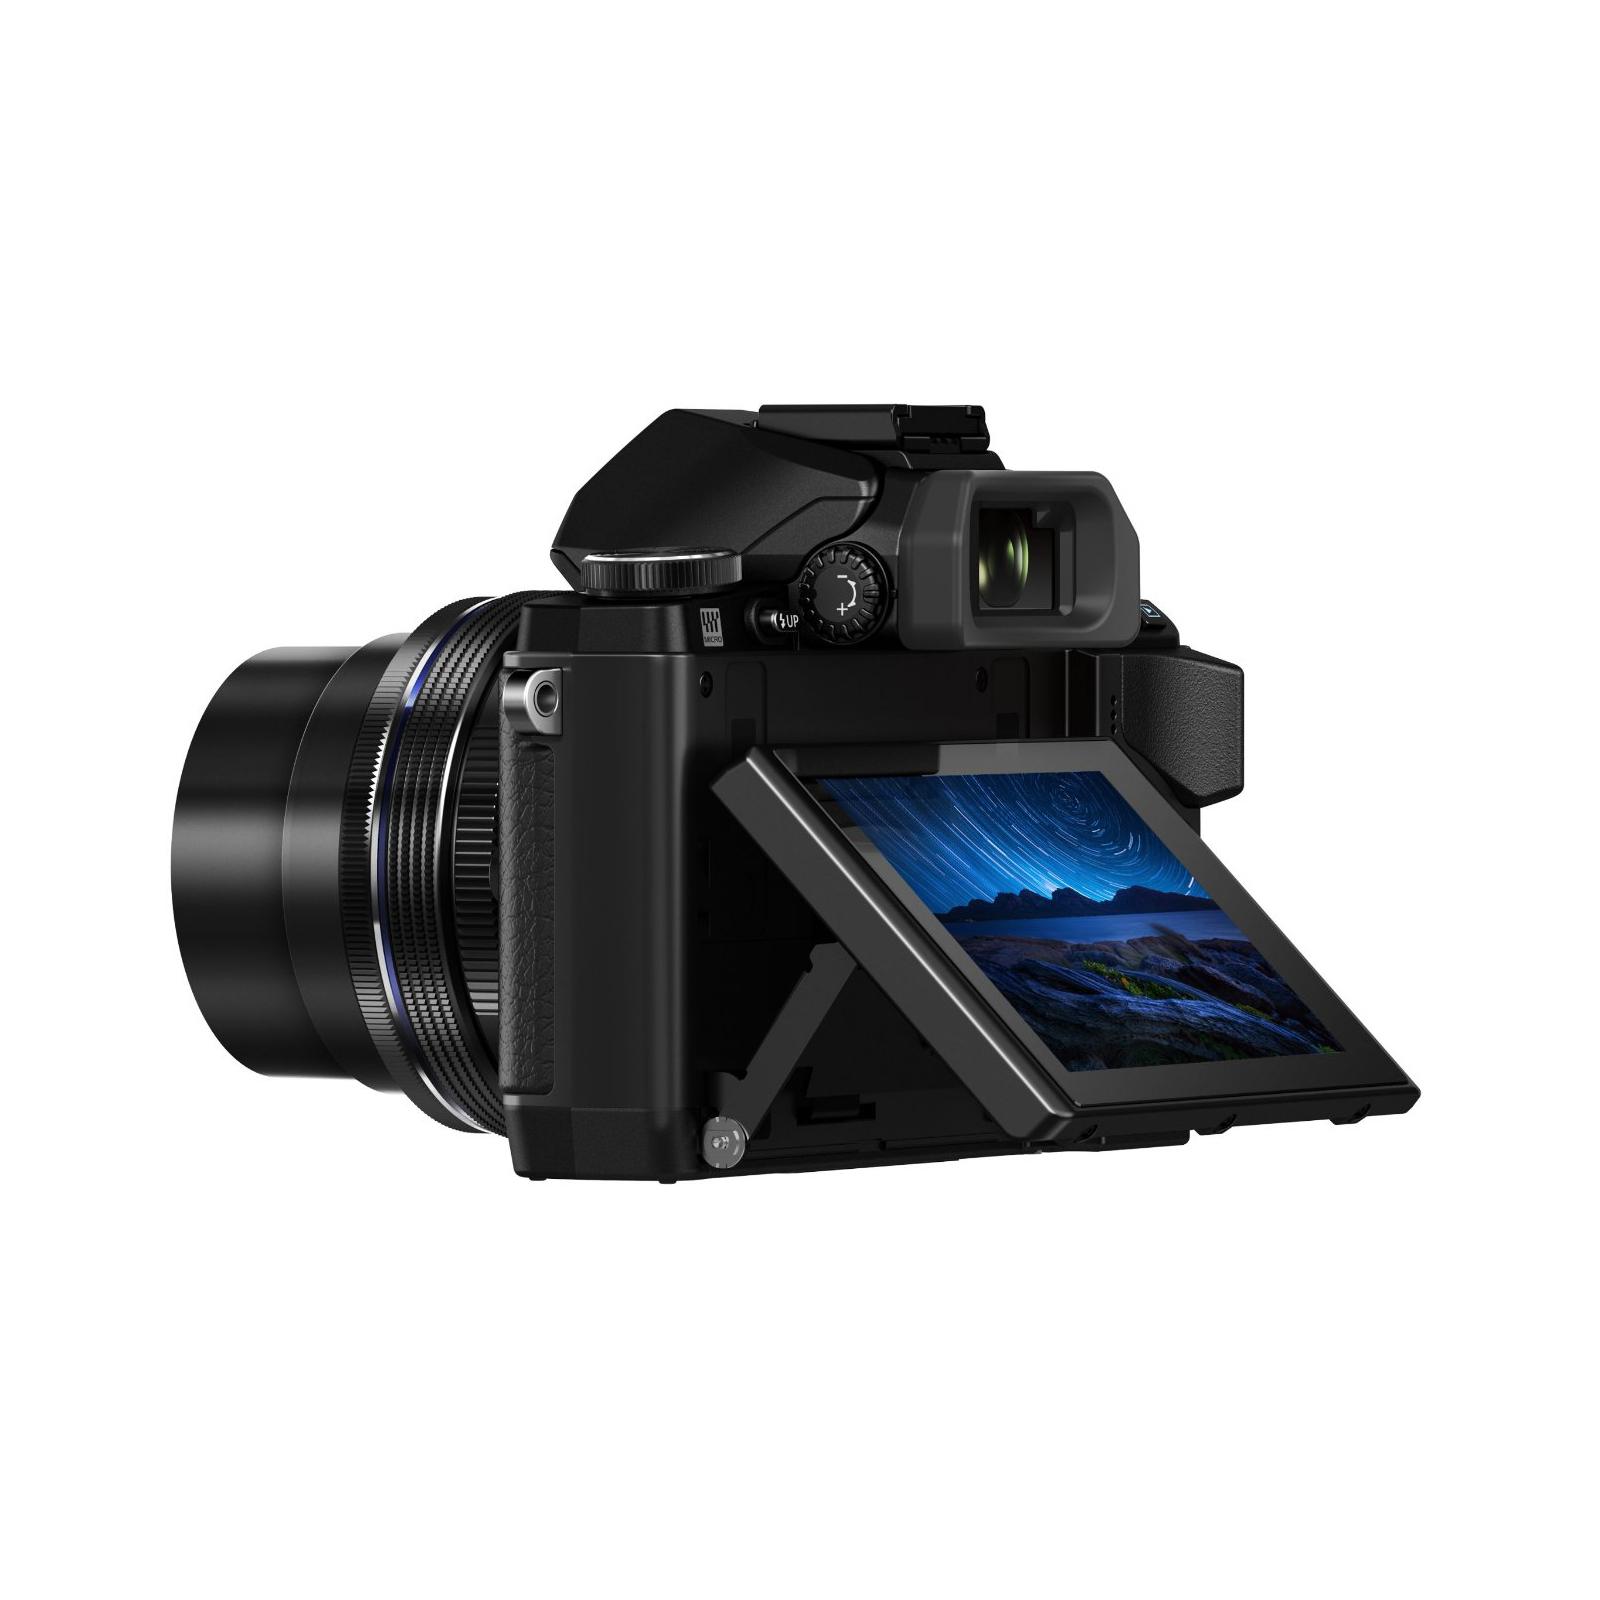 Цифровой фотоаппарат OLYMPUS E-M10 pancake zoom 14-42 Kit black/black (V207023BE000) изображение 5